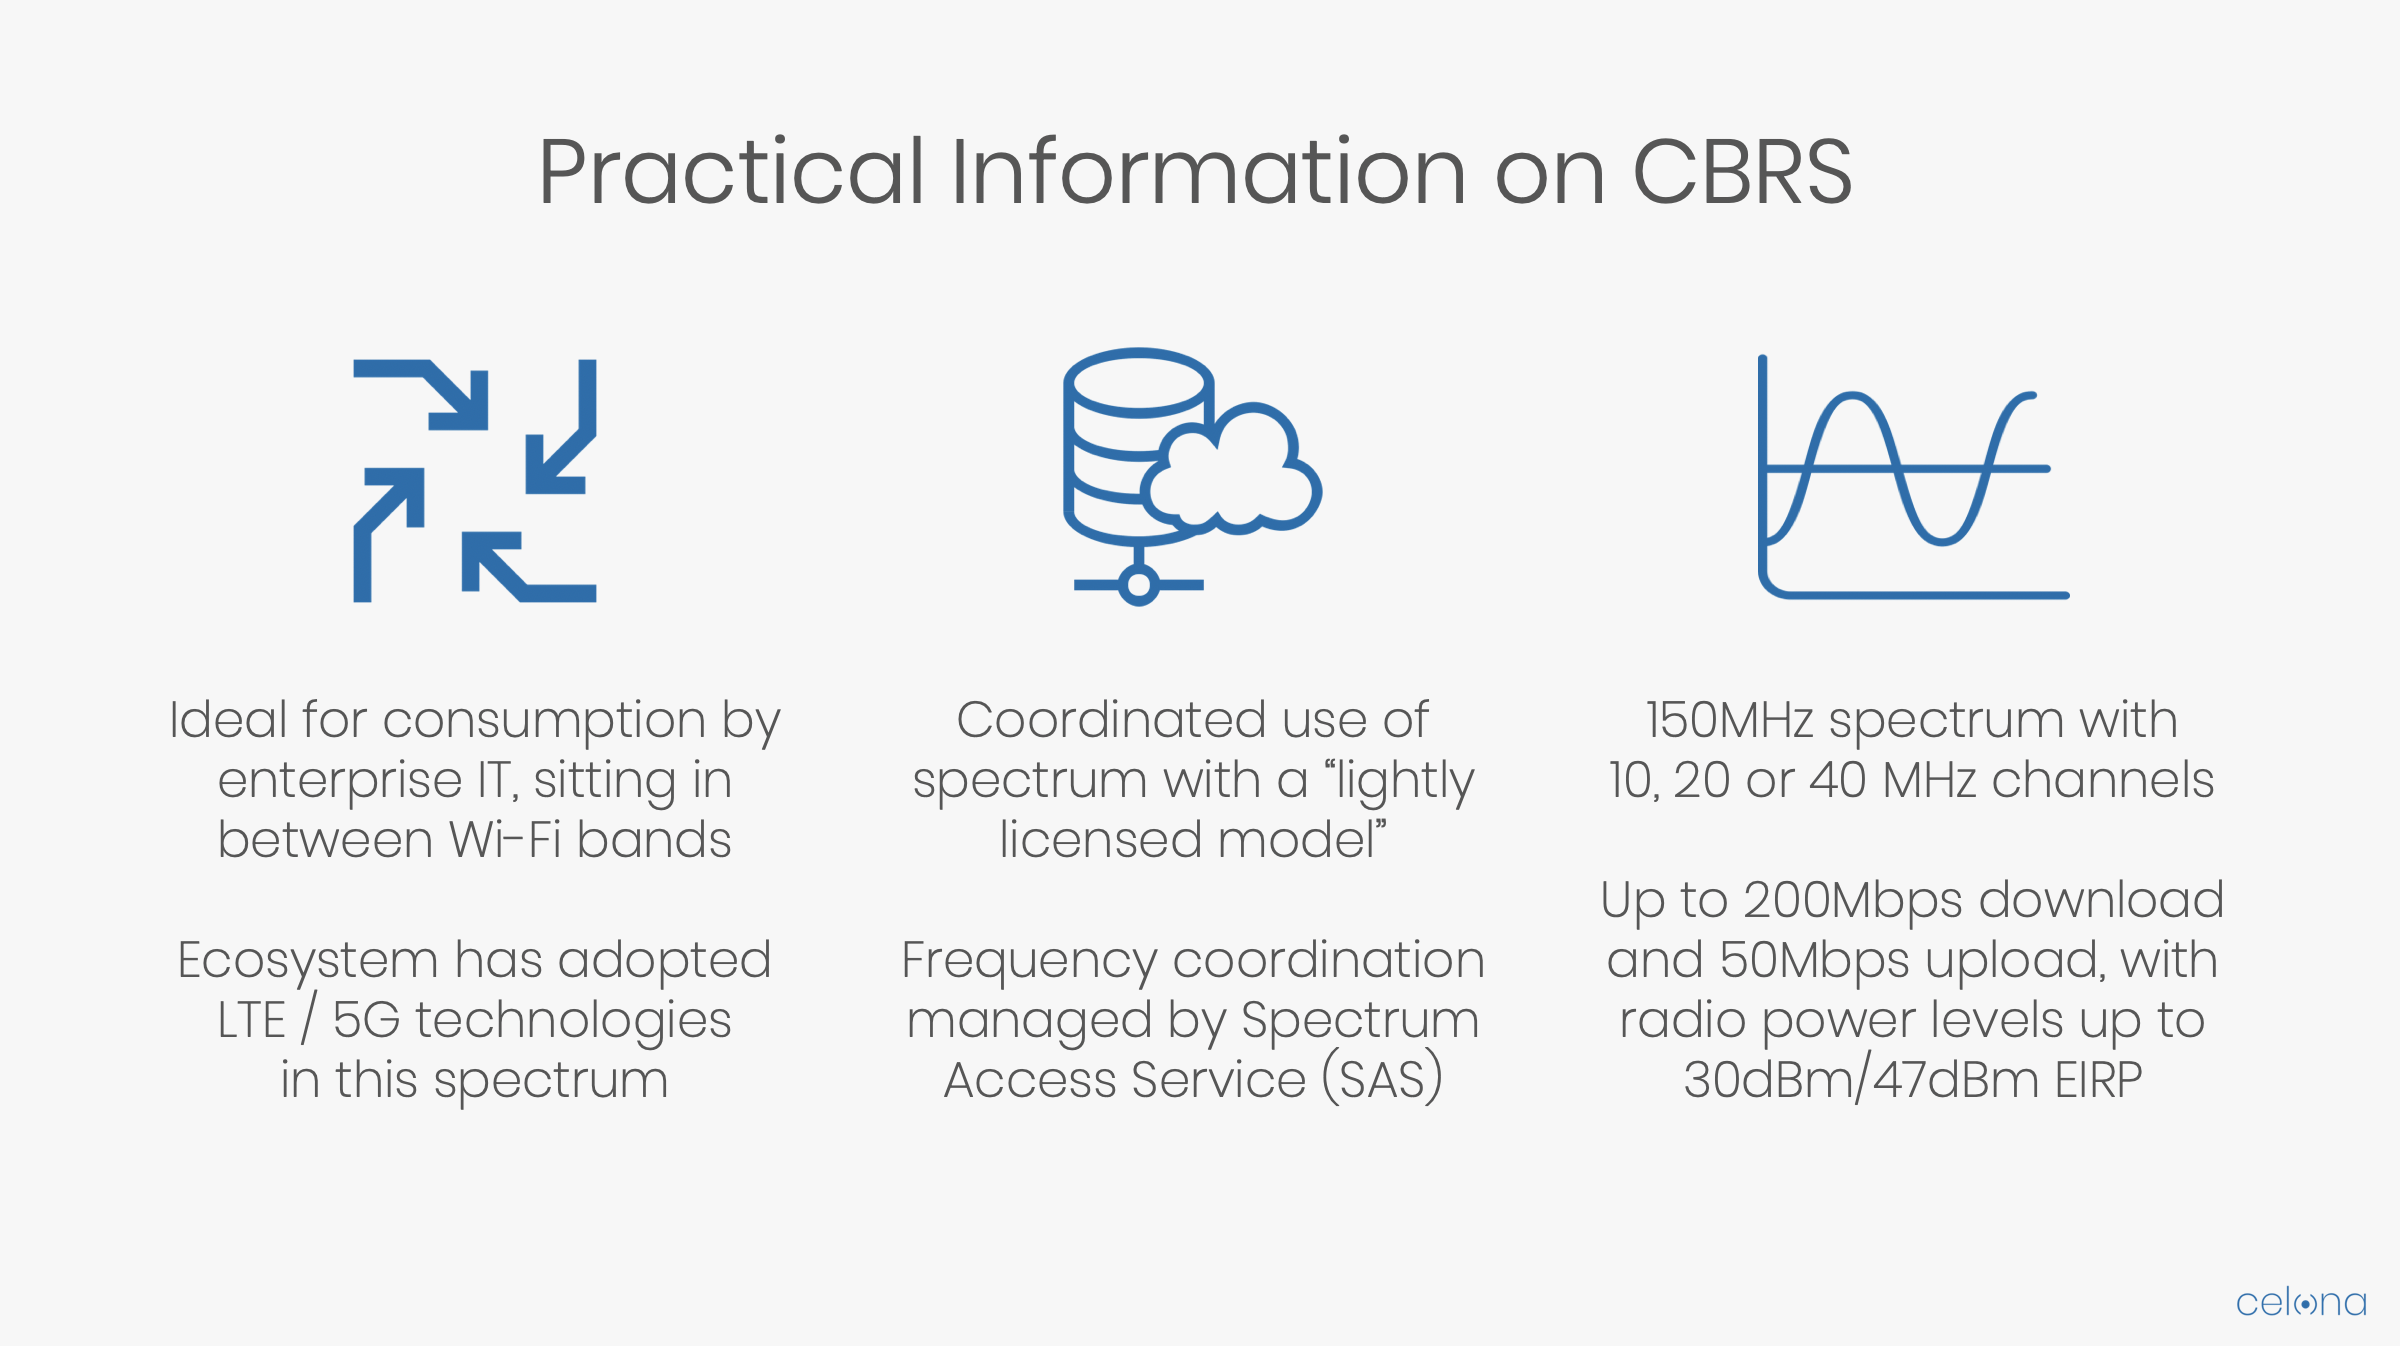 Celona Practical Information on CBRS